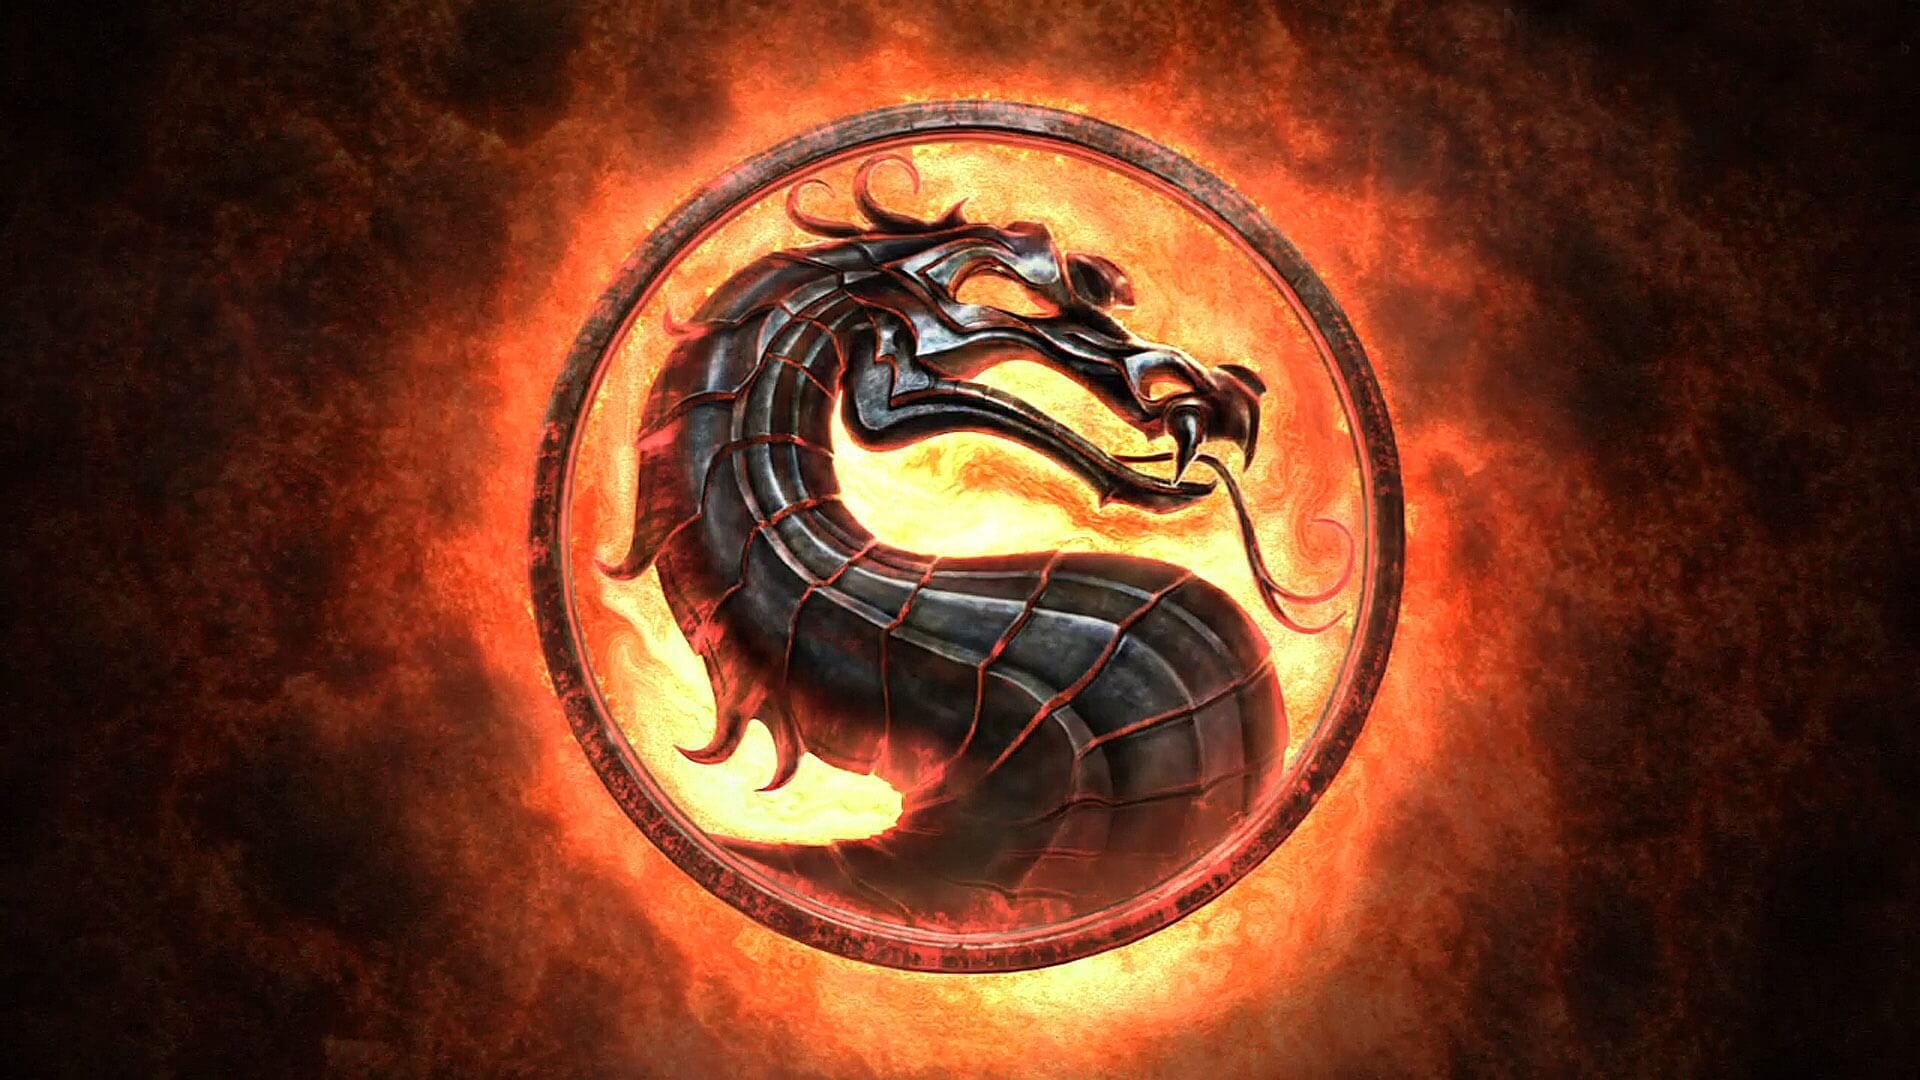 Mortal Kombat classic fire logo